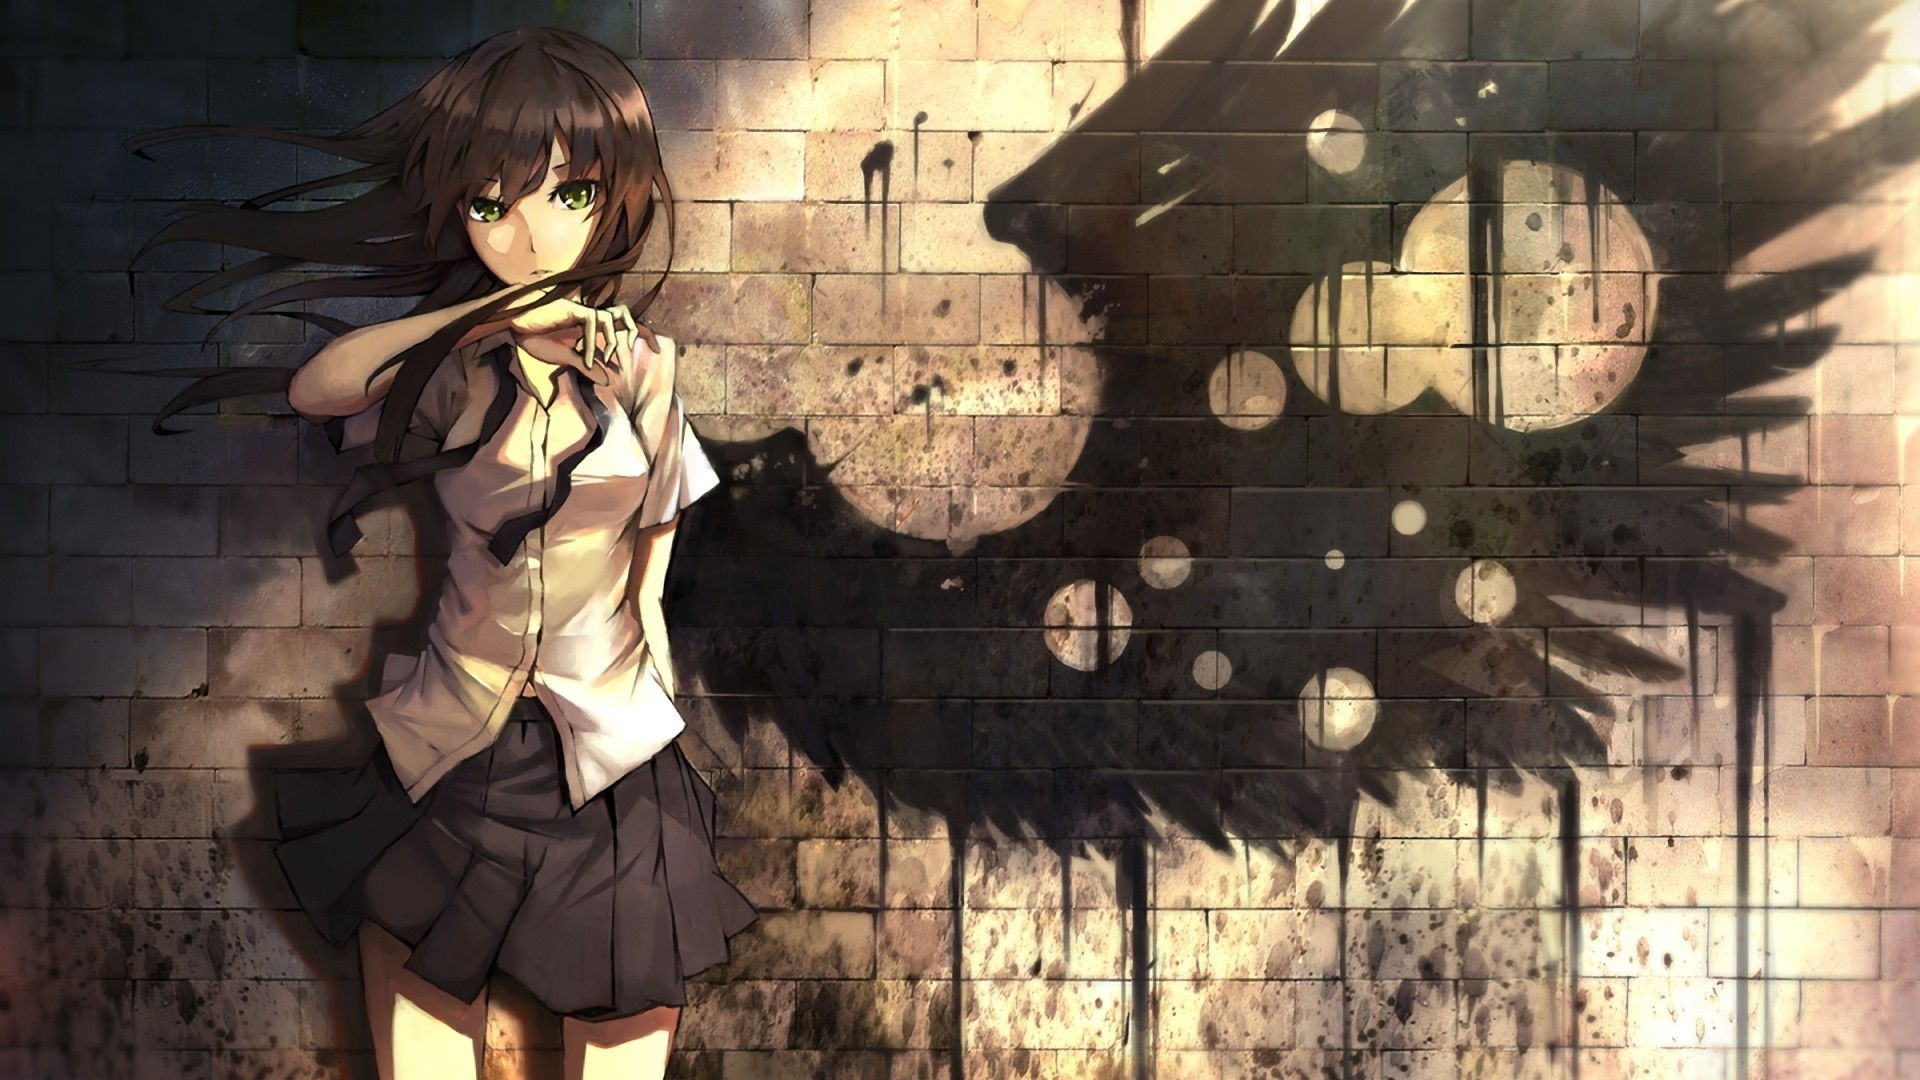 Anime Girl HD Wallpaper